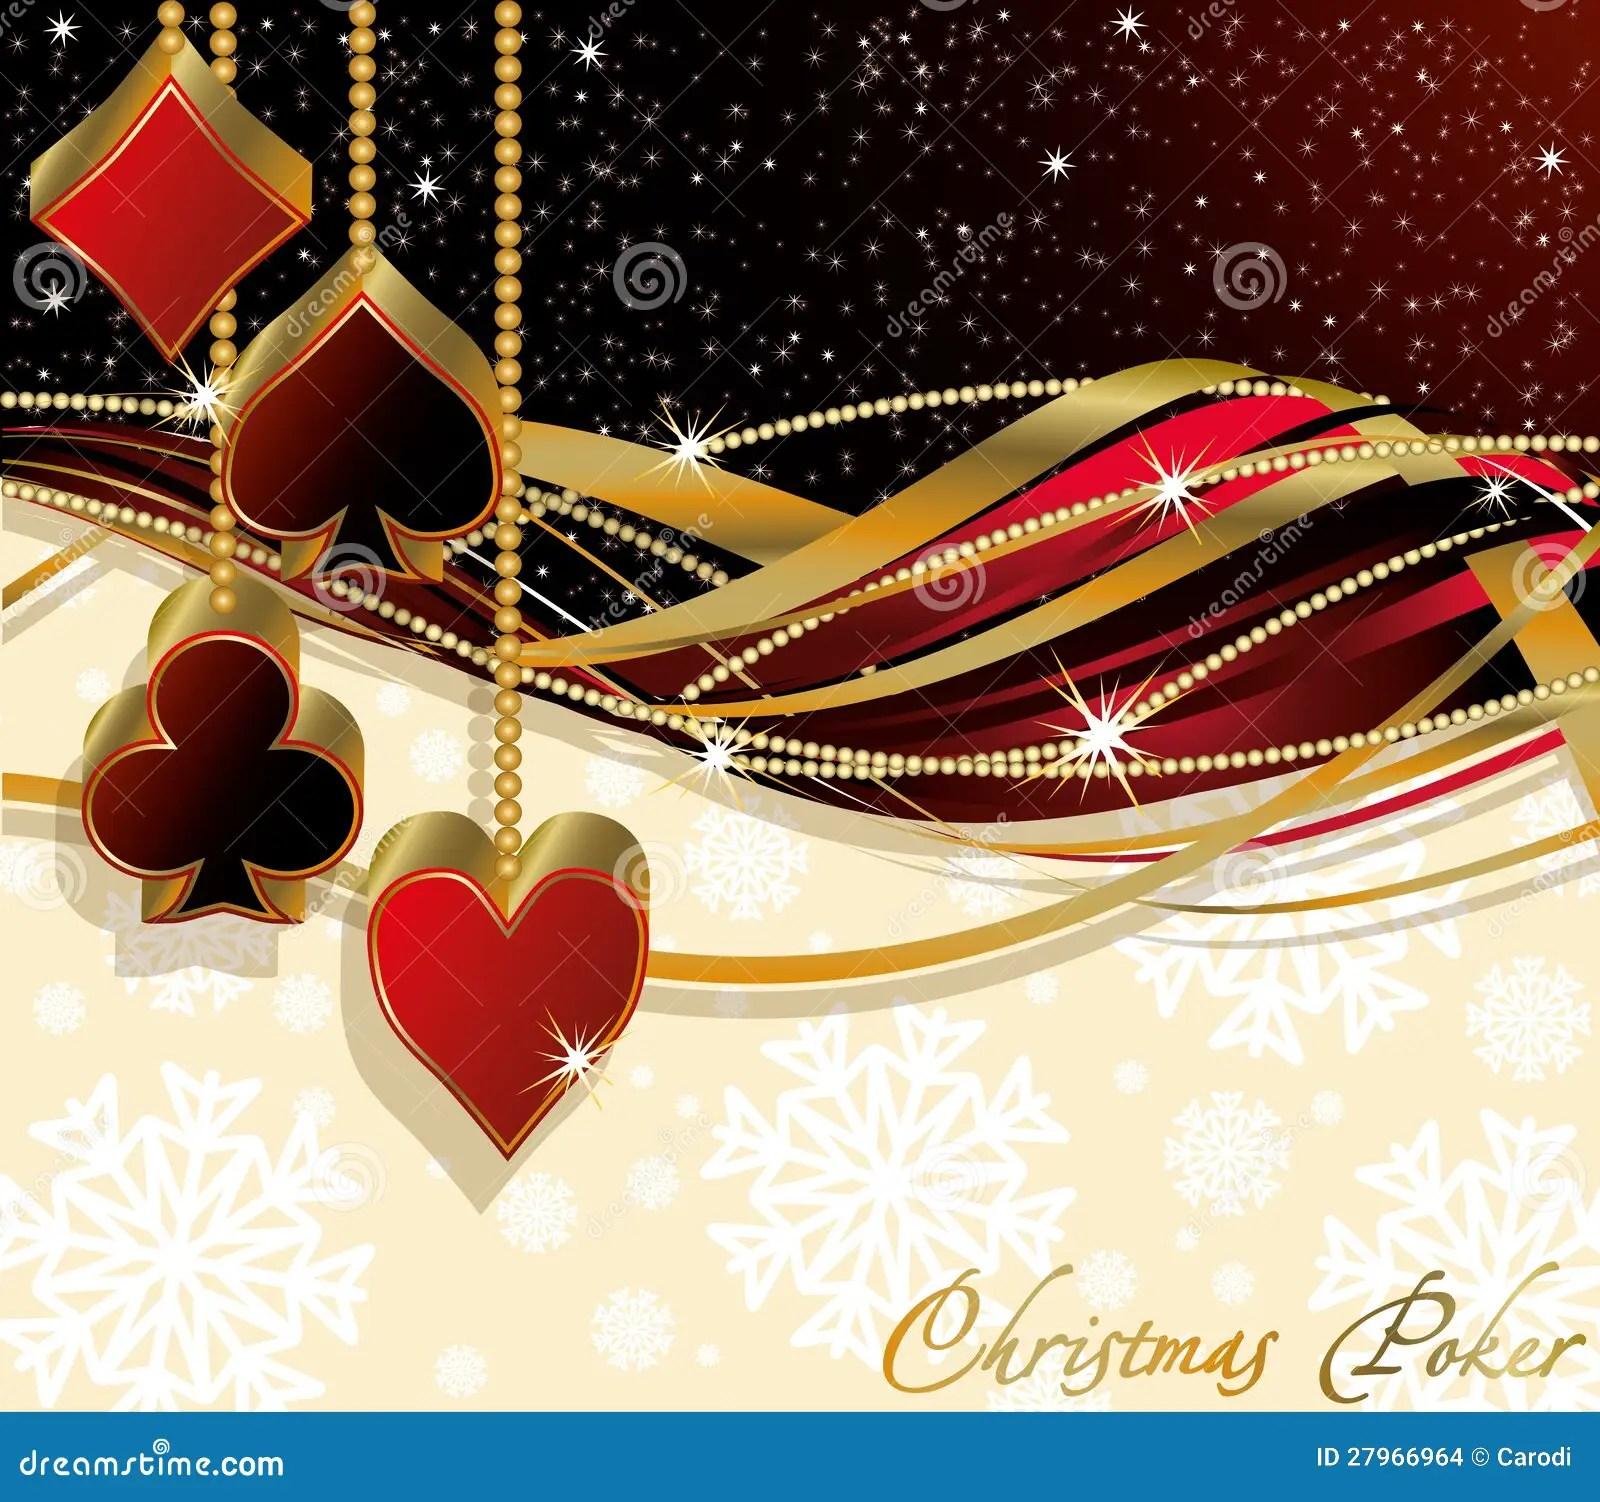 Christmas Poker Greeting Card Stock Images Image 27966964